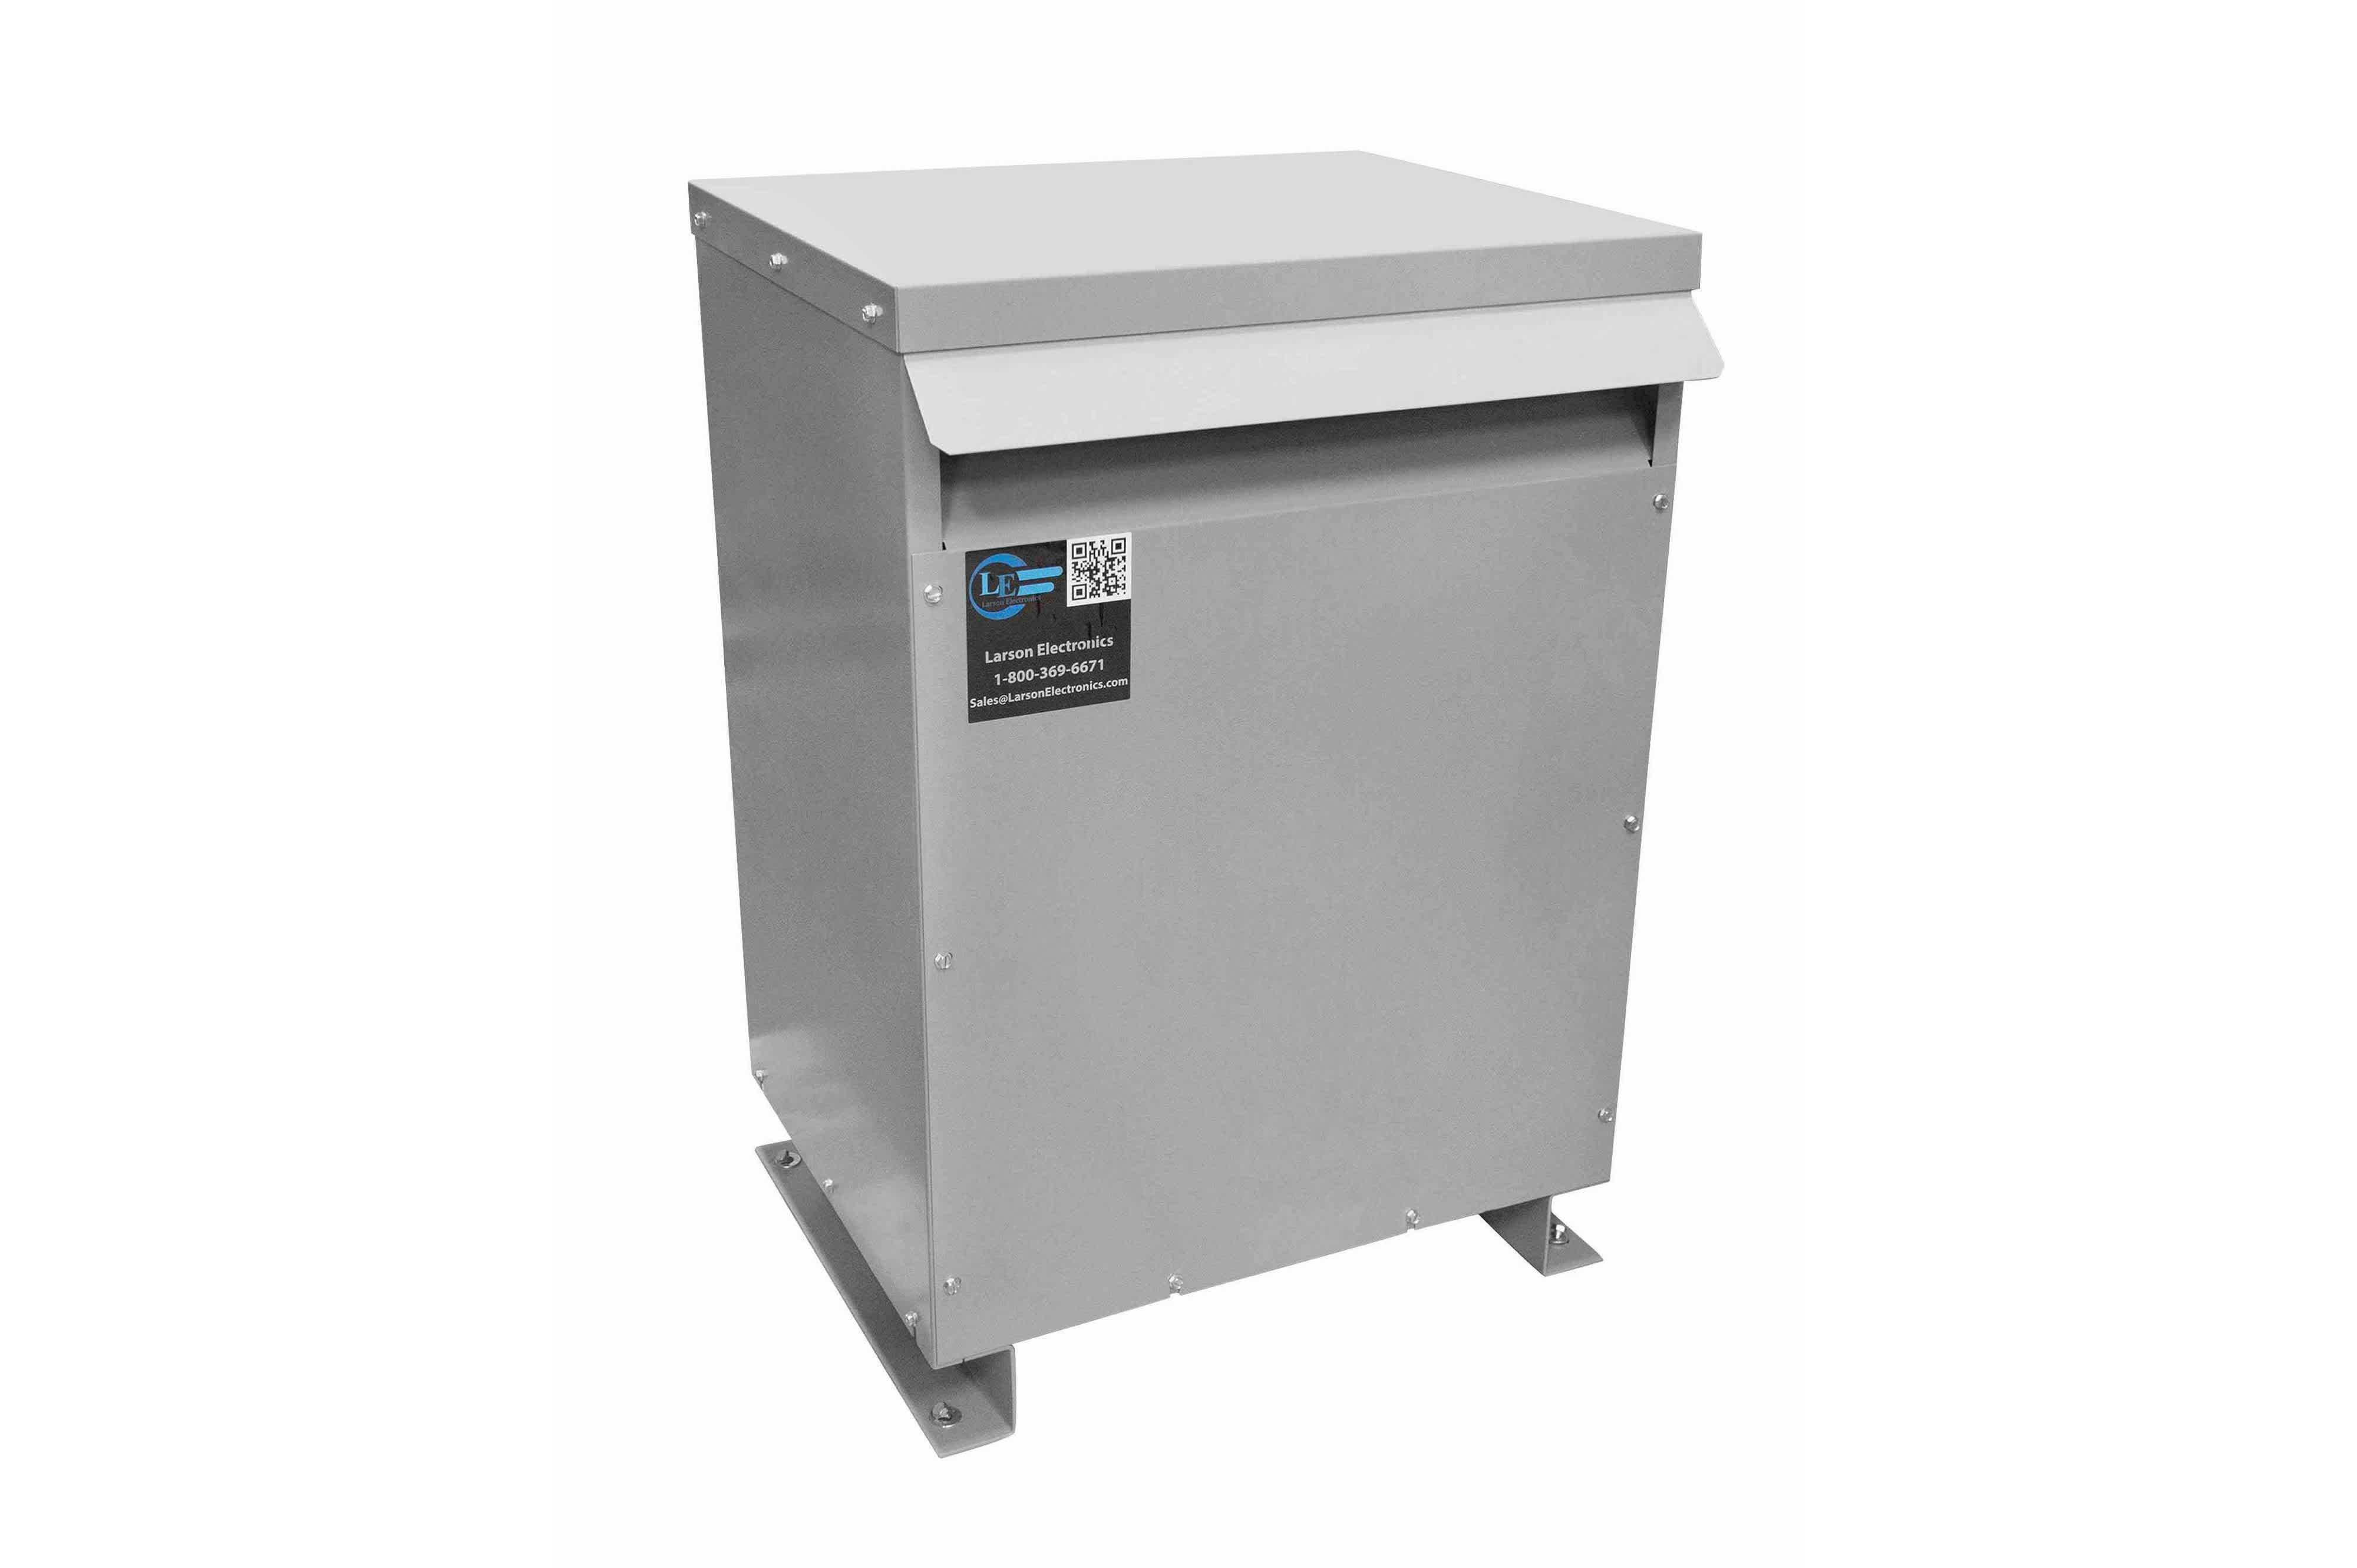 1000 kVA 3PH Isolation Transformer, 240V Wye Primary, 208Y/120 Wye-N Secondary, N3R, Ventilated, 60 Hz